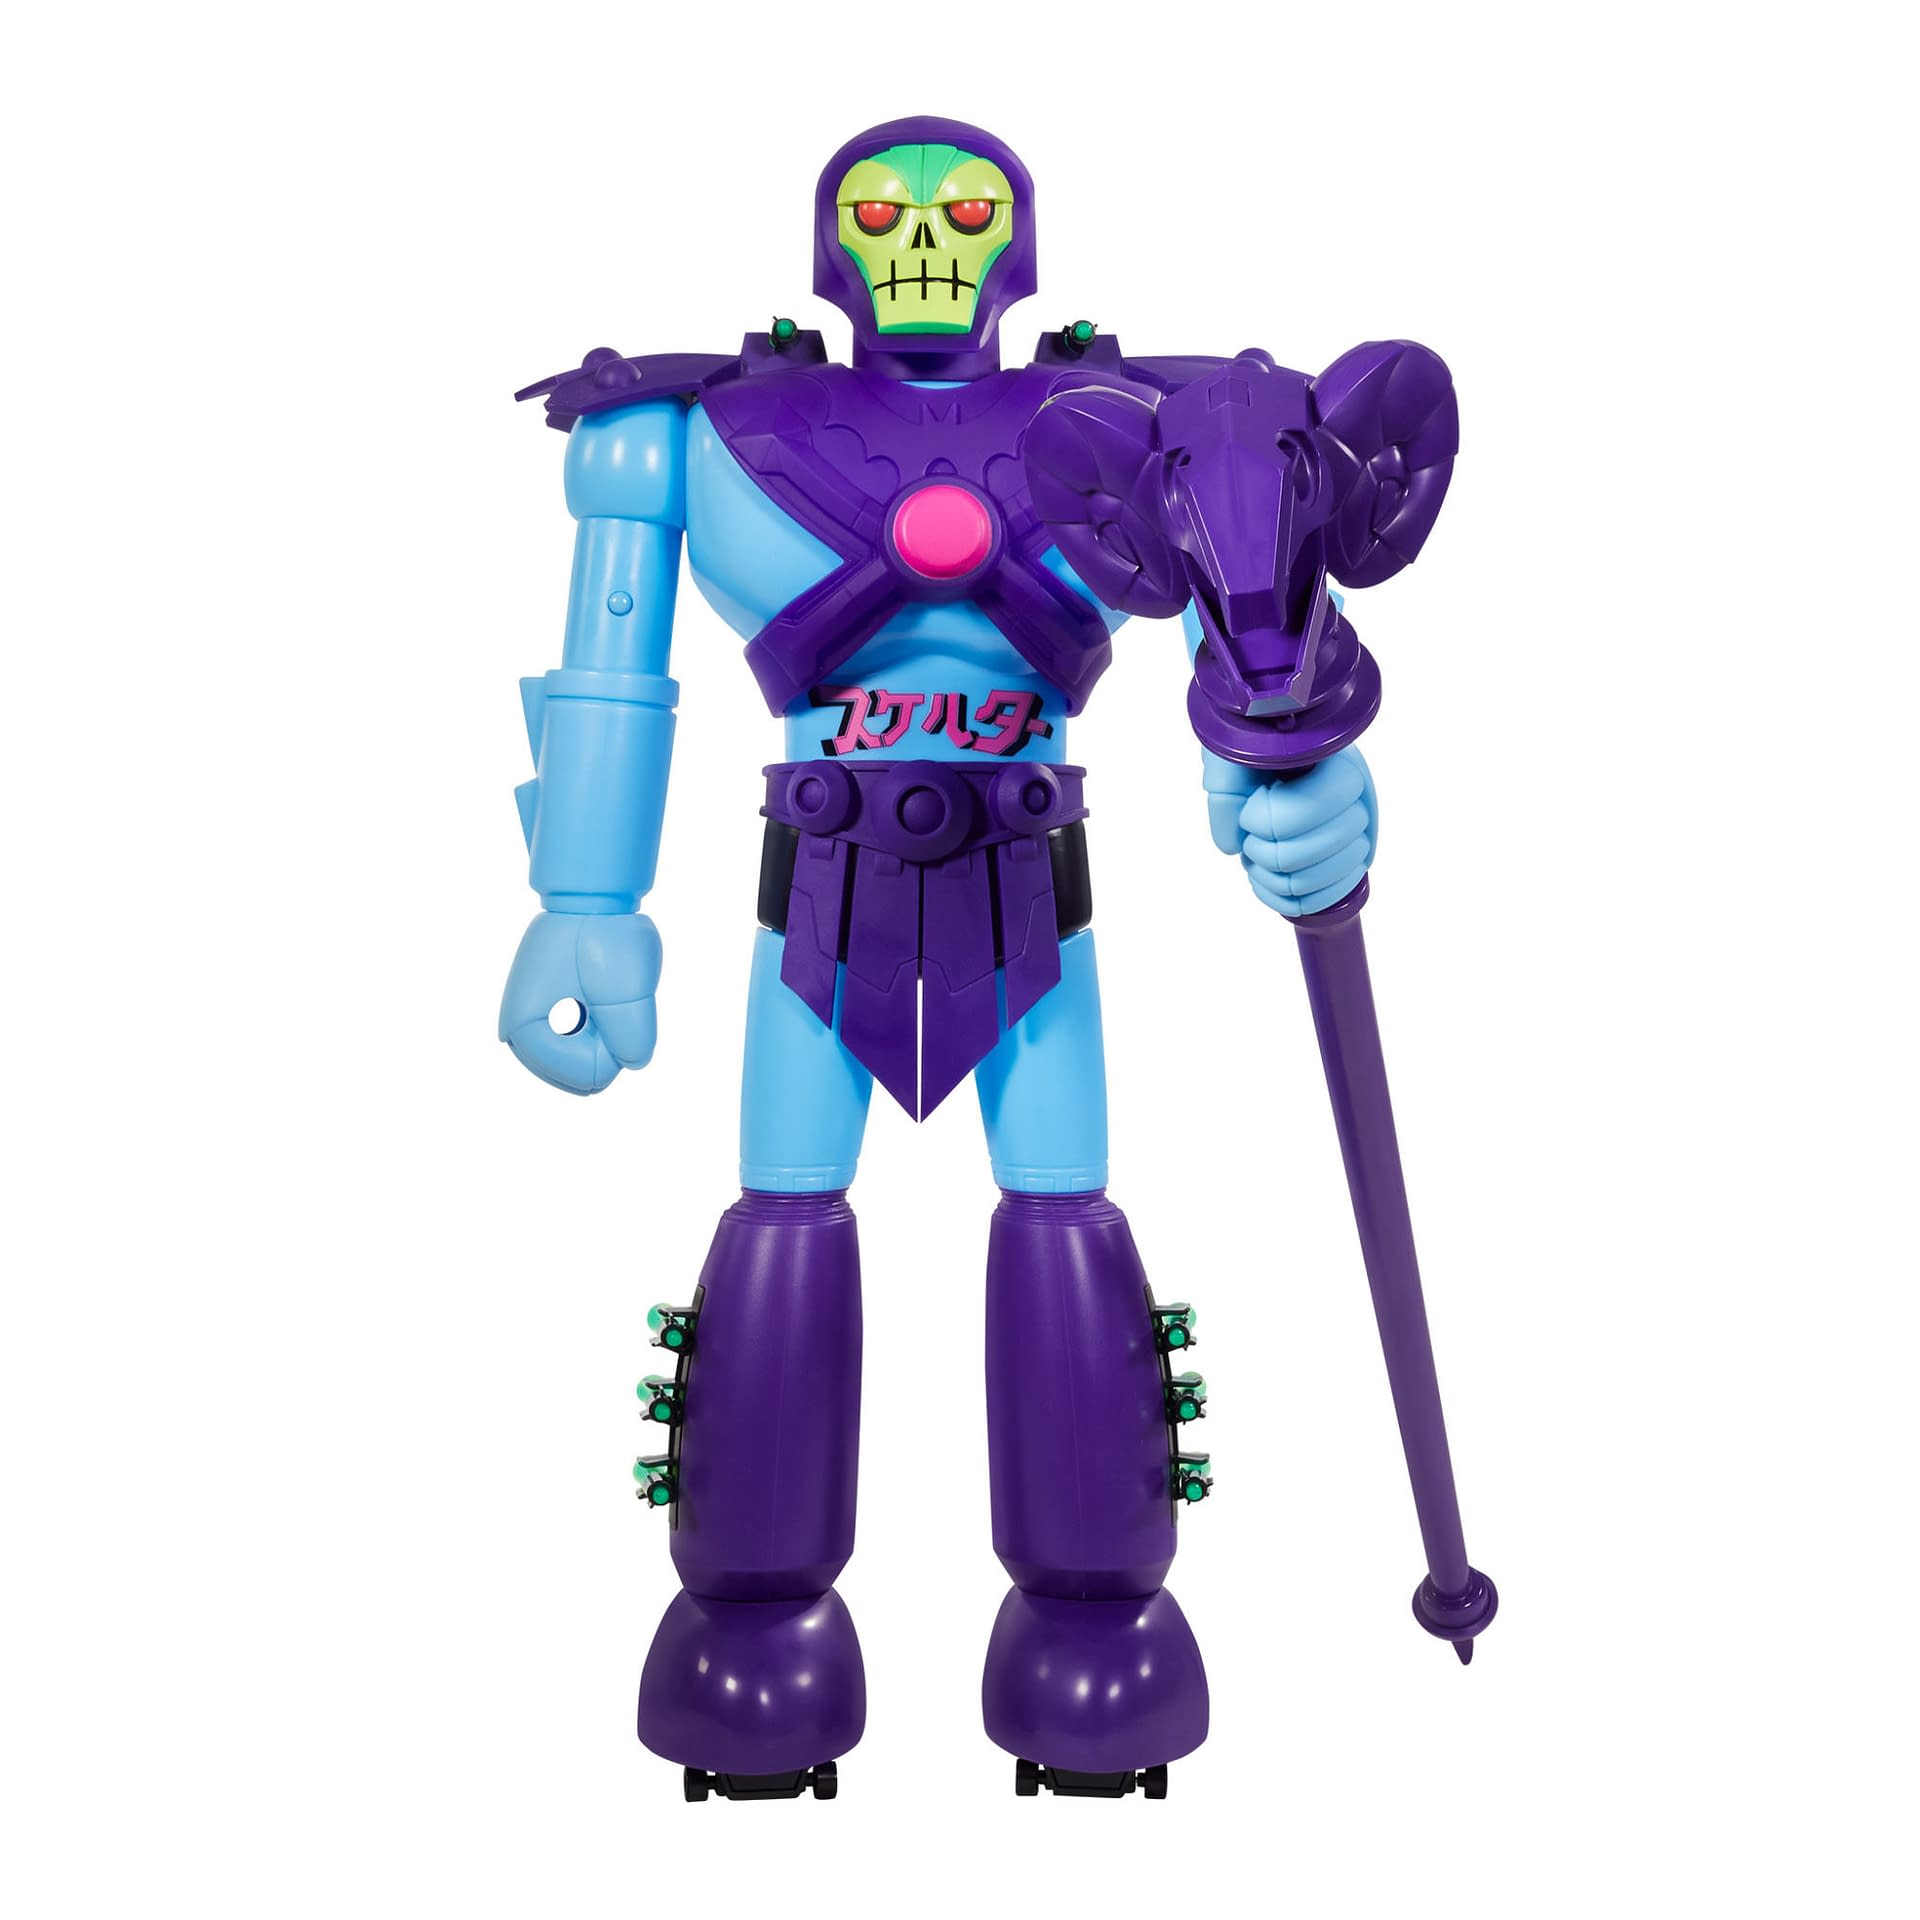 Skeletor Shogun Masters Figure Revealed For Mattel Creations